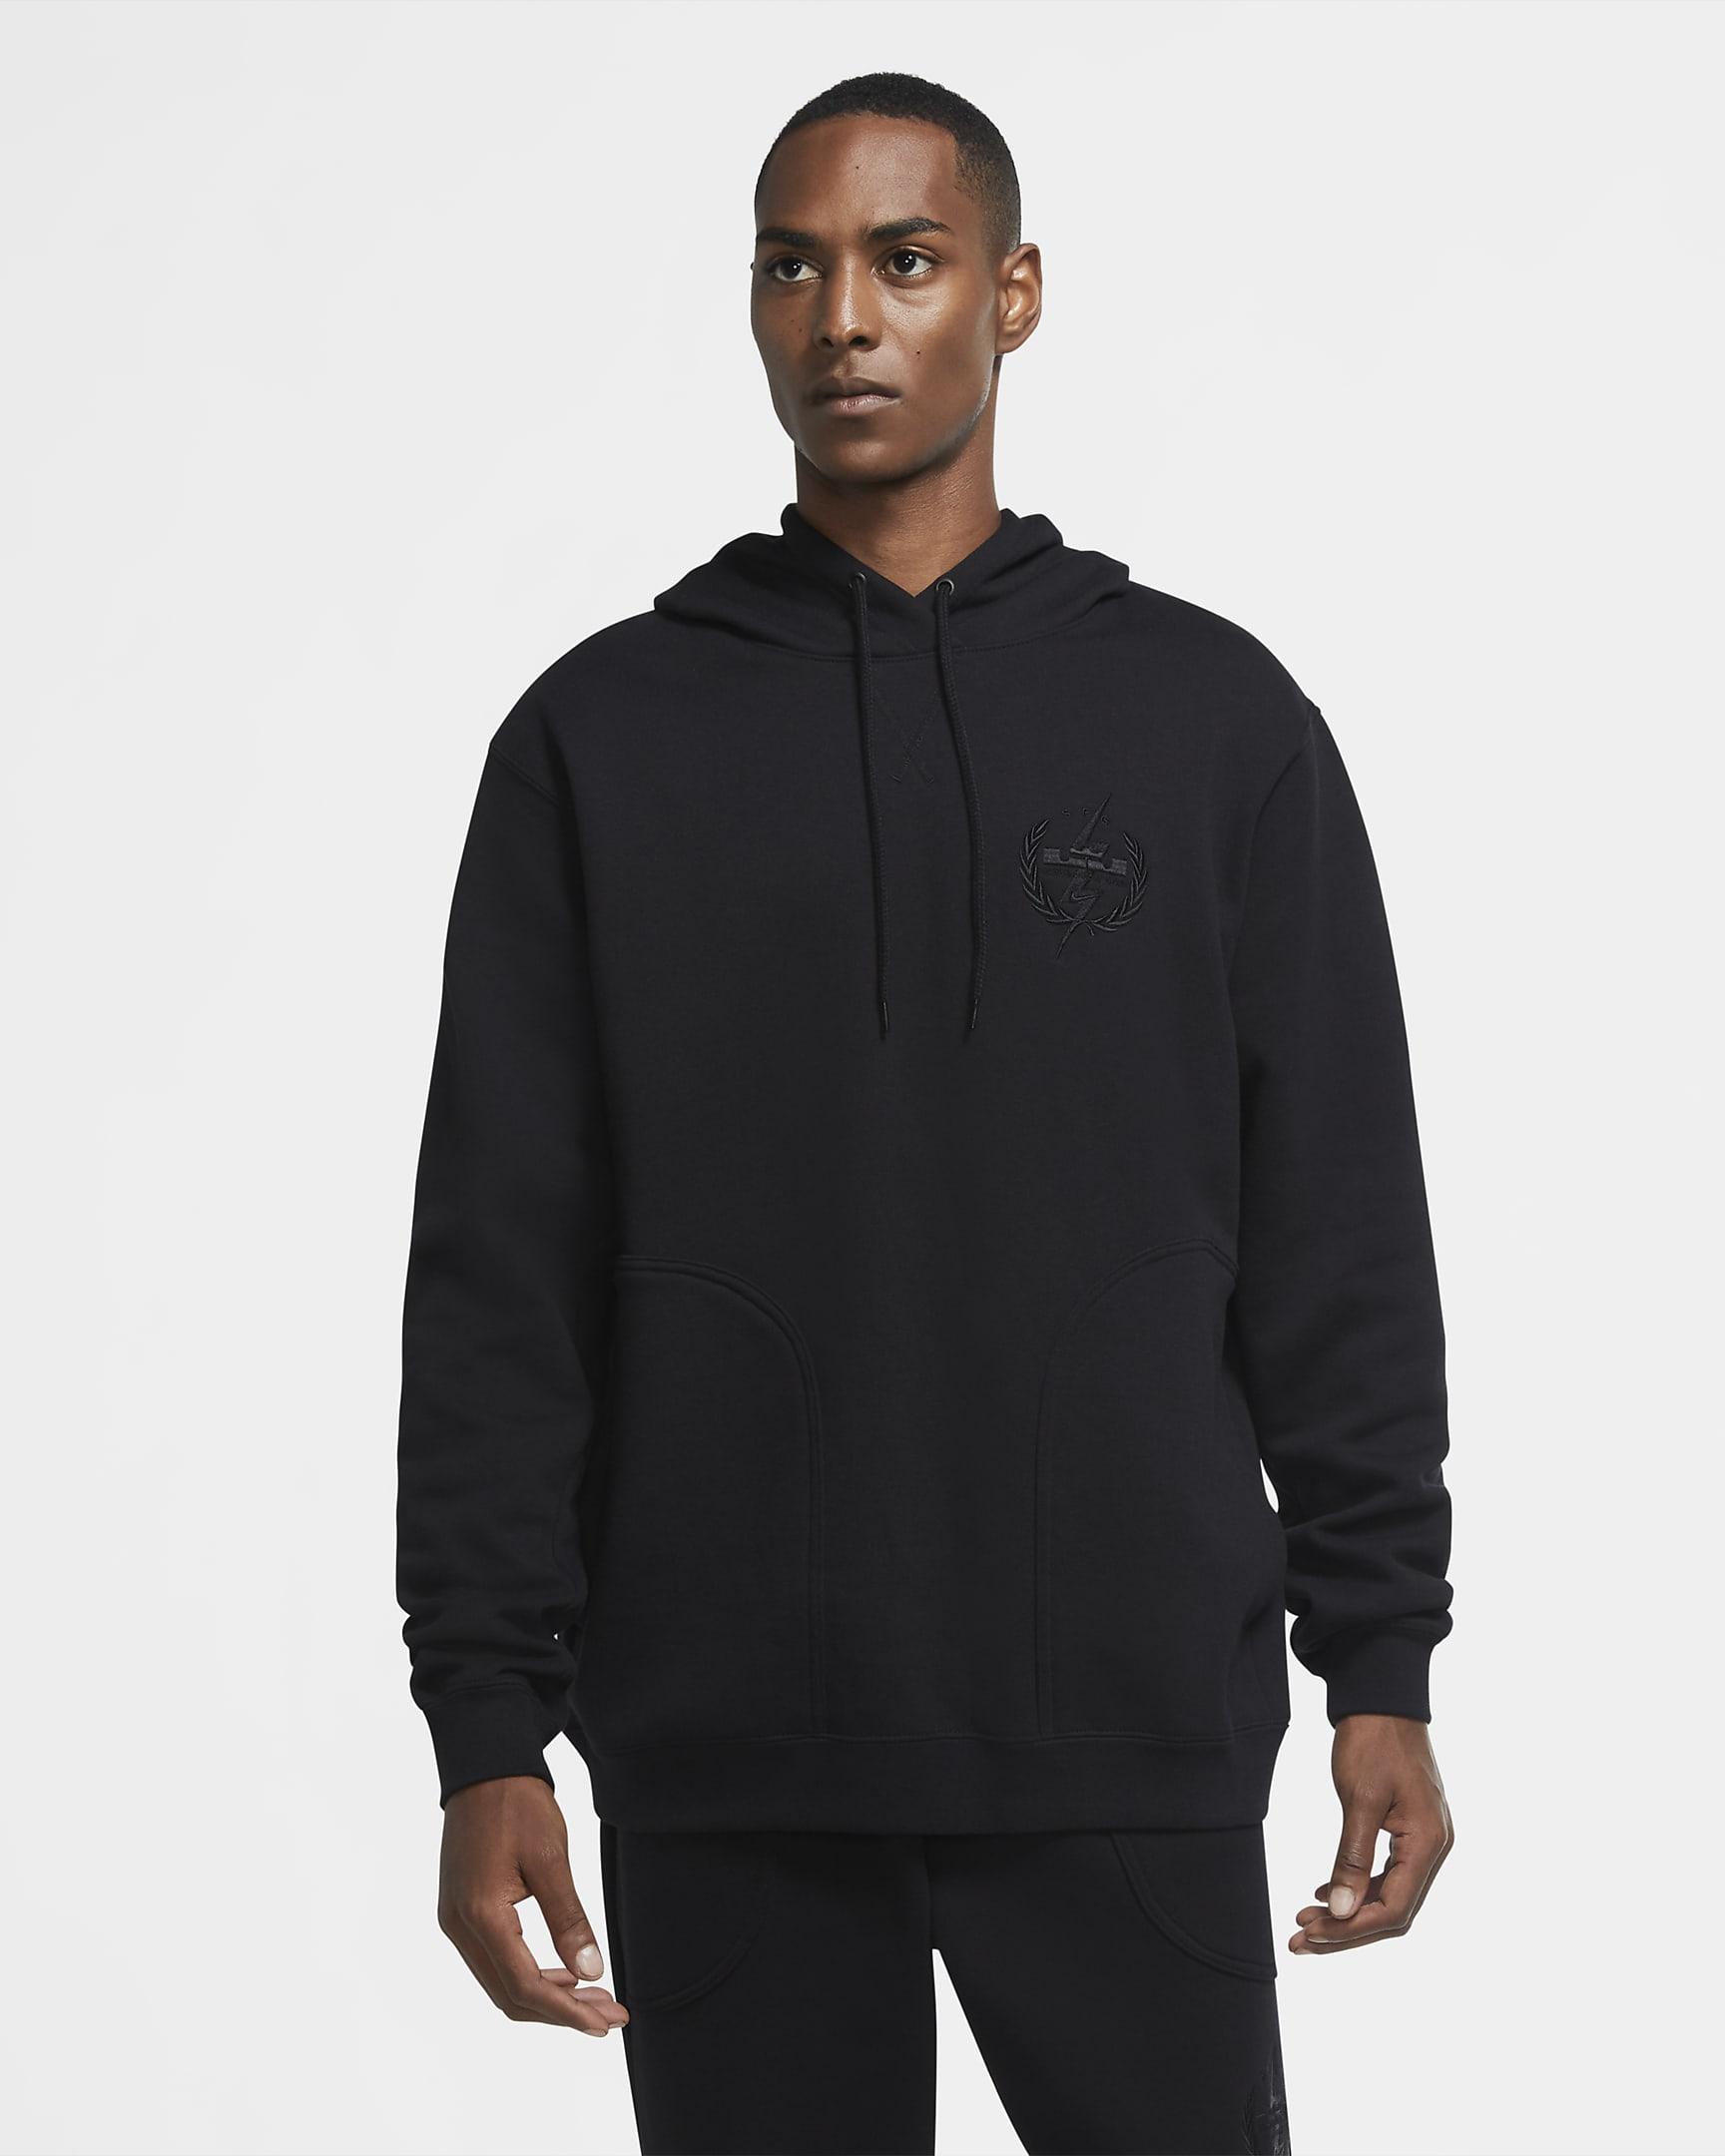 lebron-mens-pullover-hoodie-PmPN2T-1